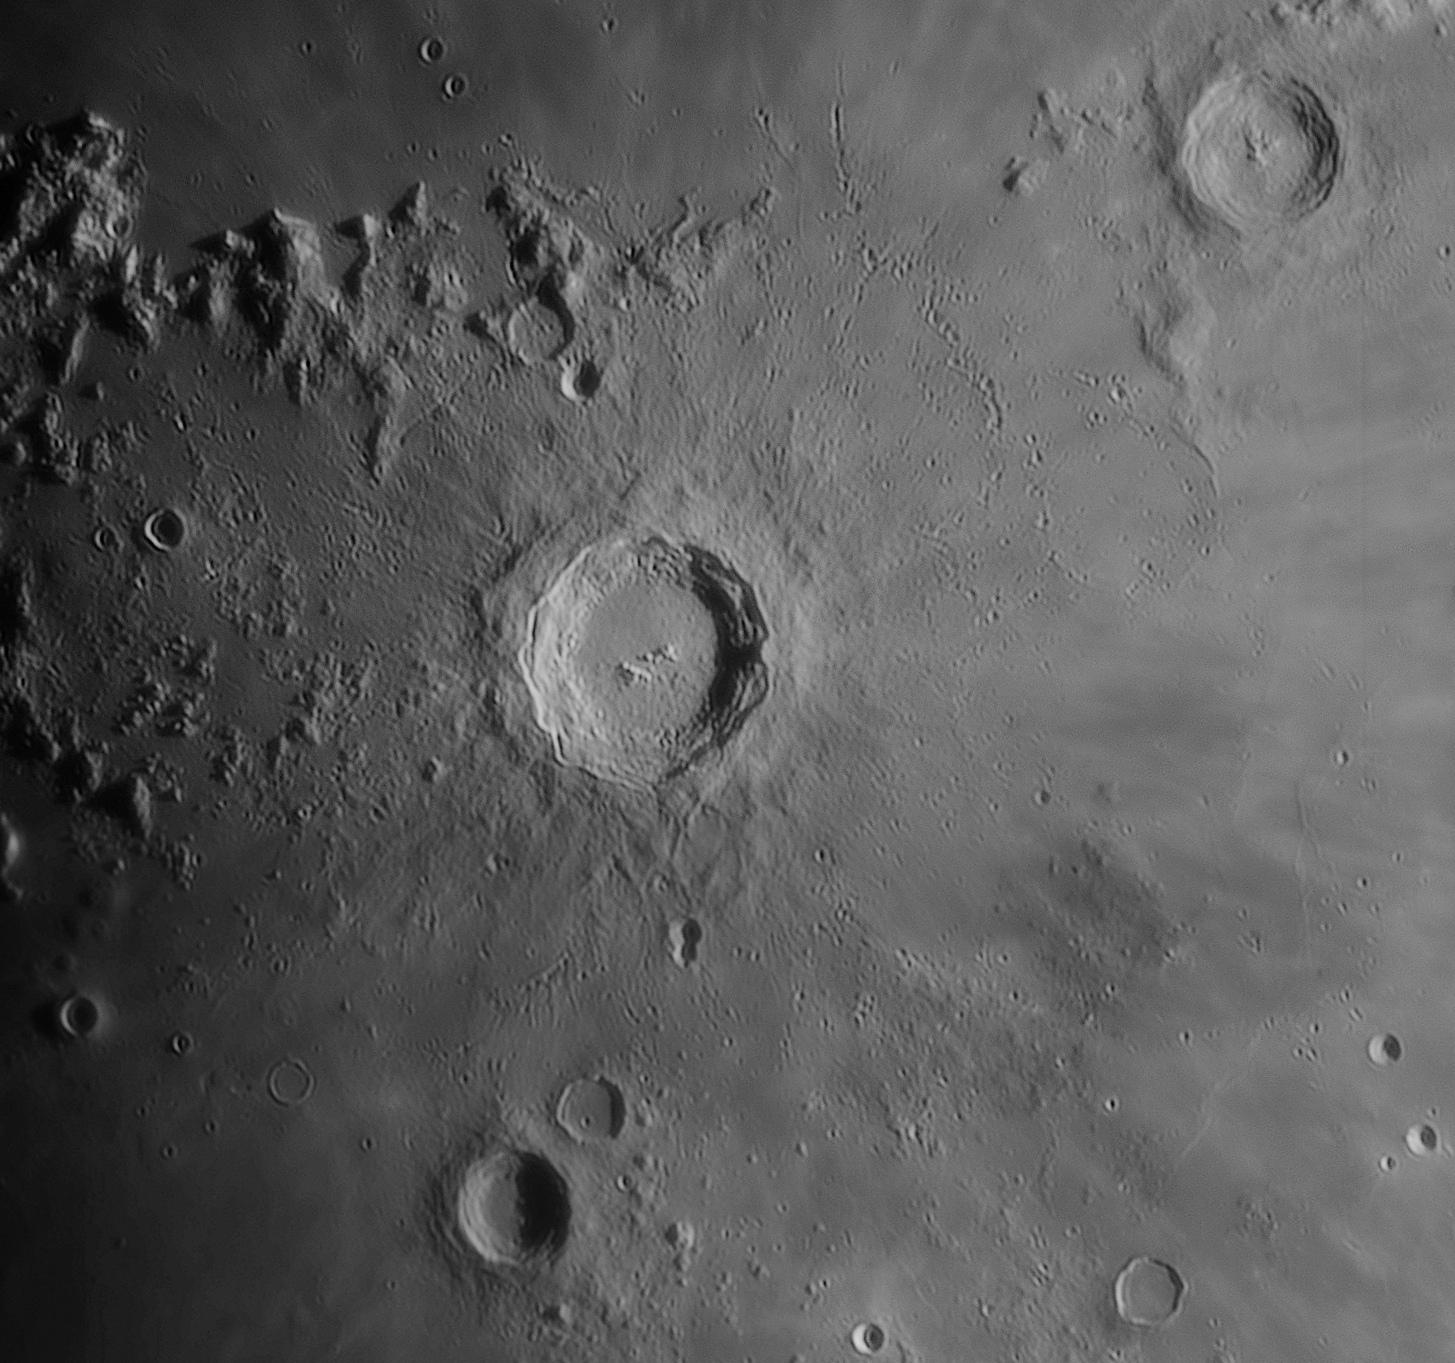 Copernic2.jpg.870804b04cbbbcbd30d266c35e901c1d.jpg